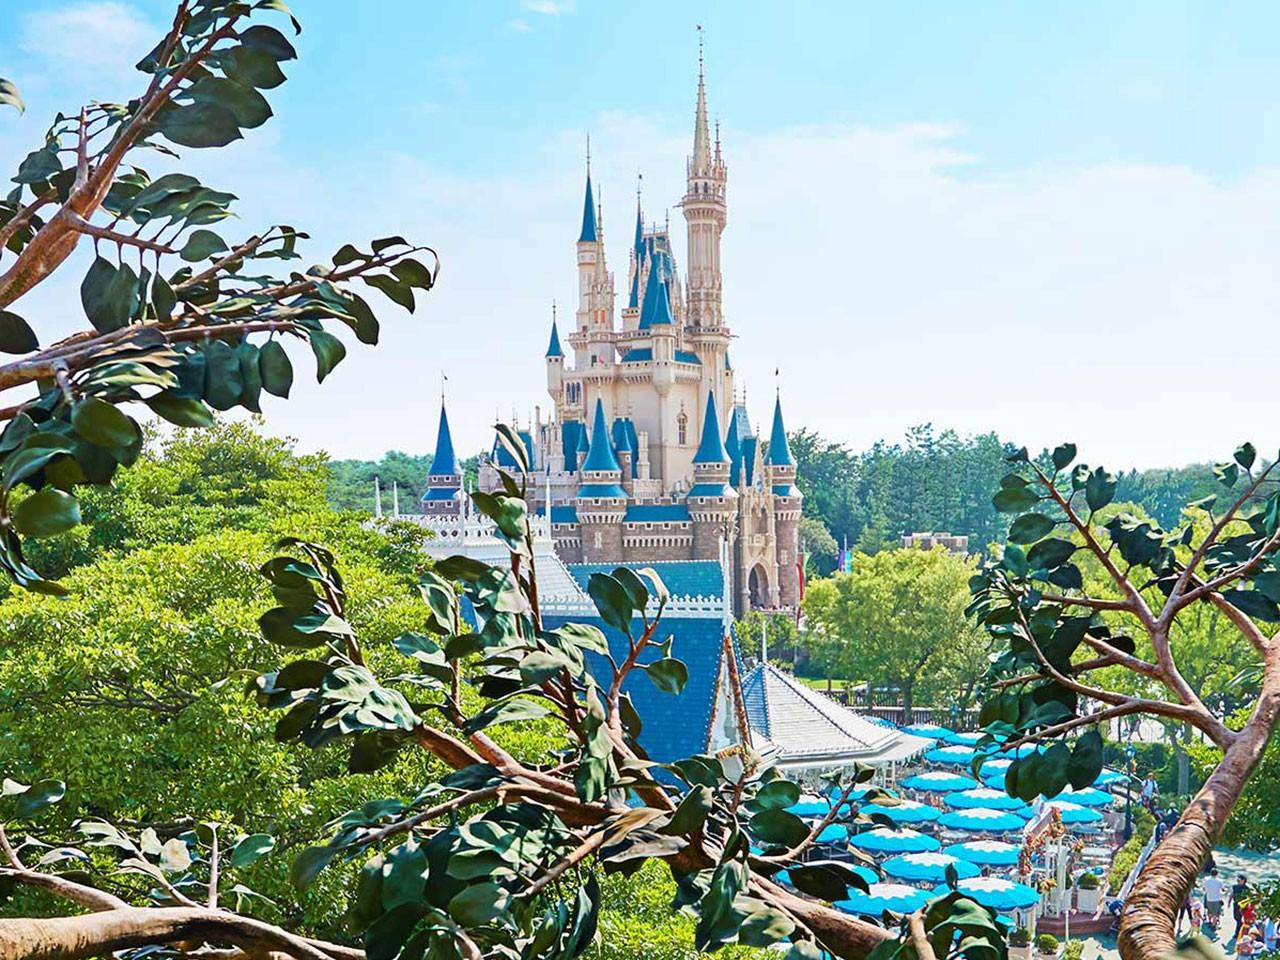 Experiencing Tokyo Disneyland to the fullest